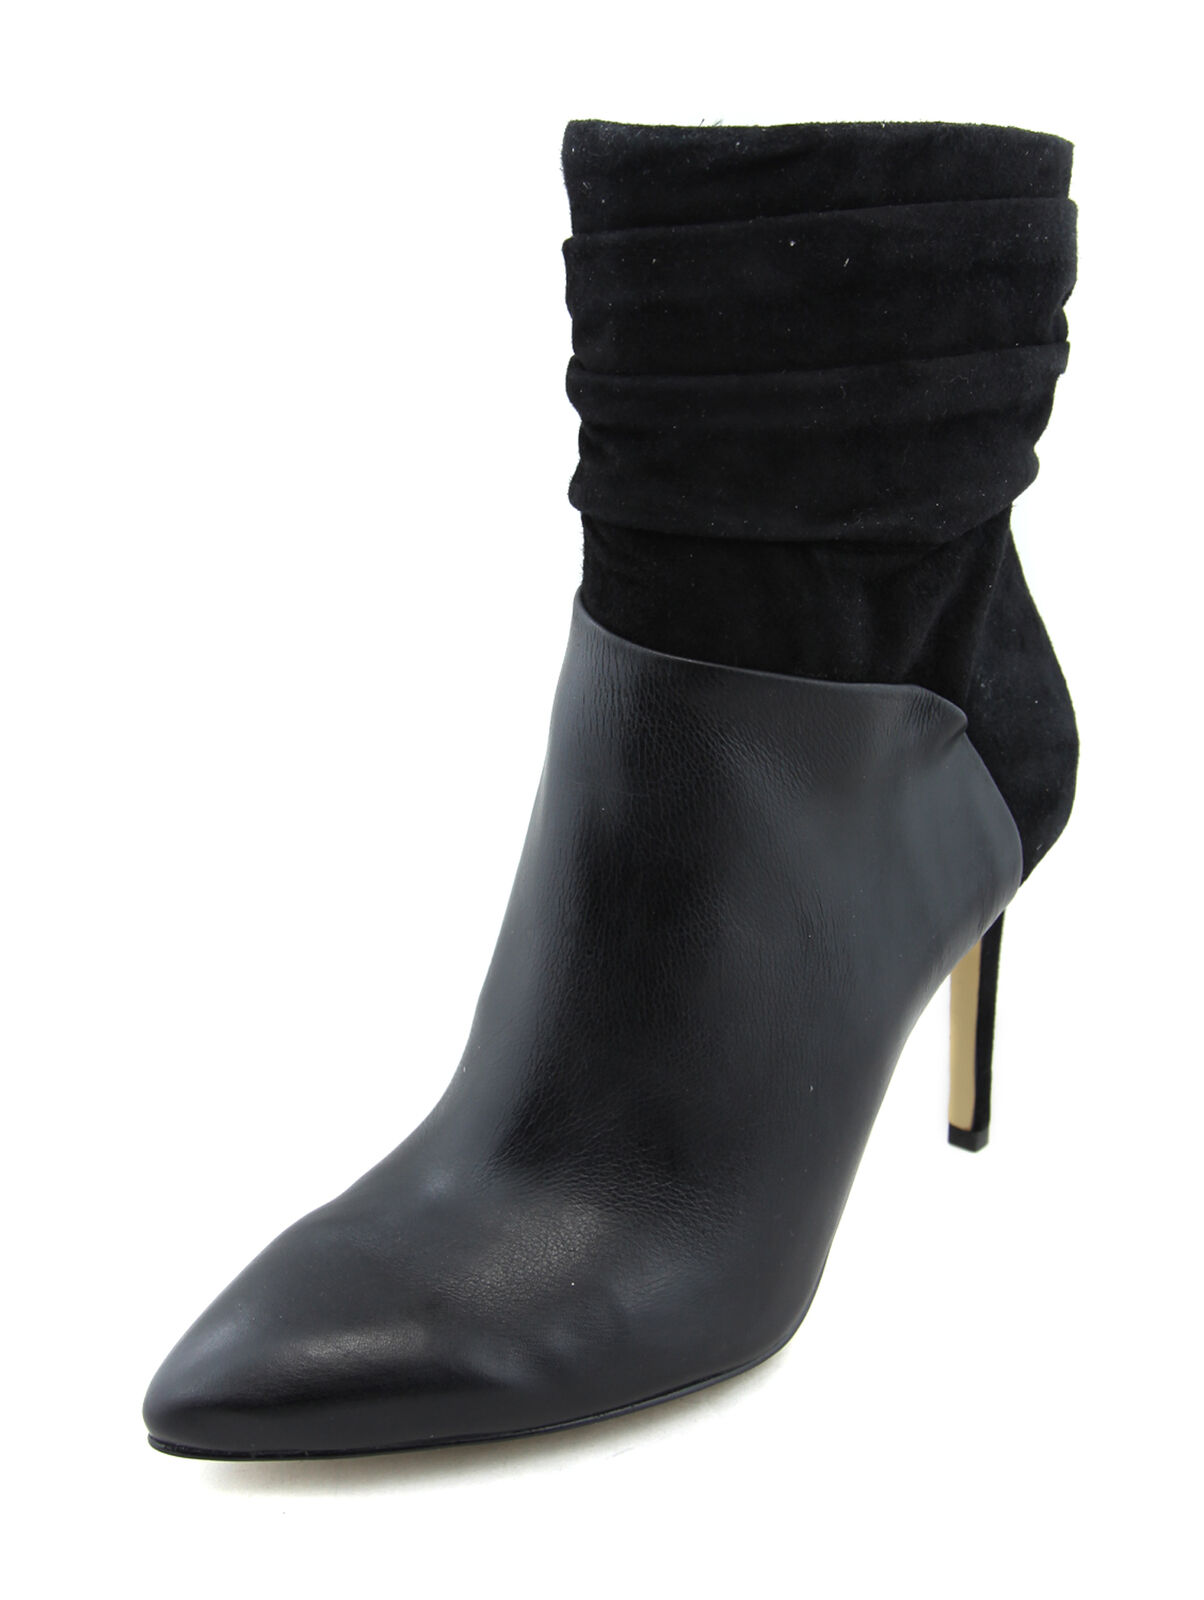 consegna gratuita e veloce disponibile Guess Donna  nero Vvidlet Vvidlet Vvidlet Multi Leather Pointed Dress avvioie scarpe Ret  159 N  comprare a buon mercato